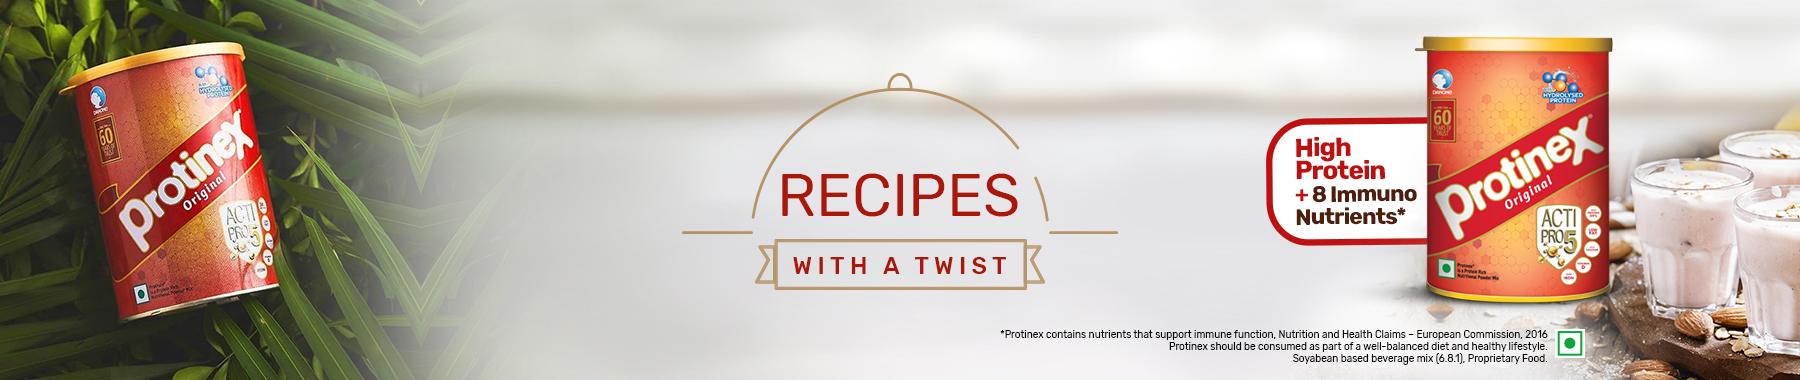 recipe banner